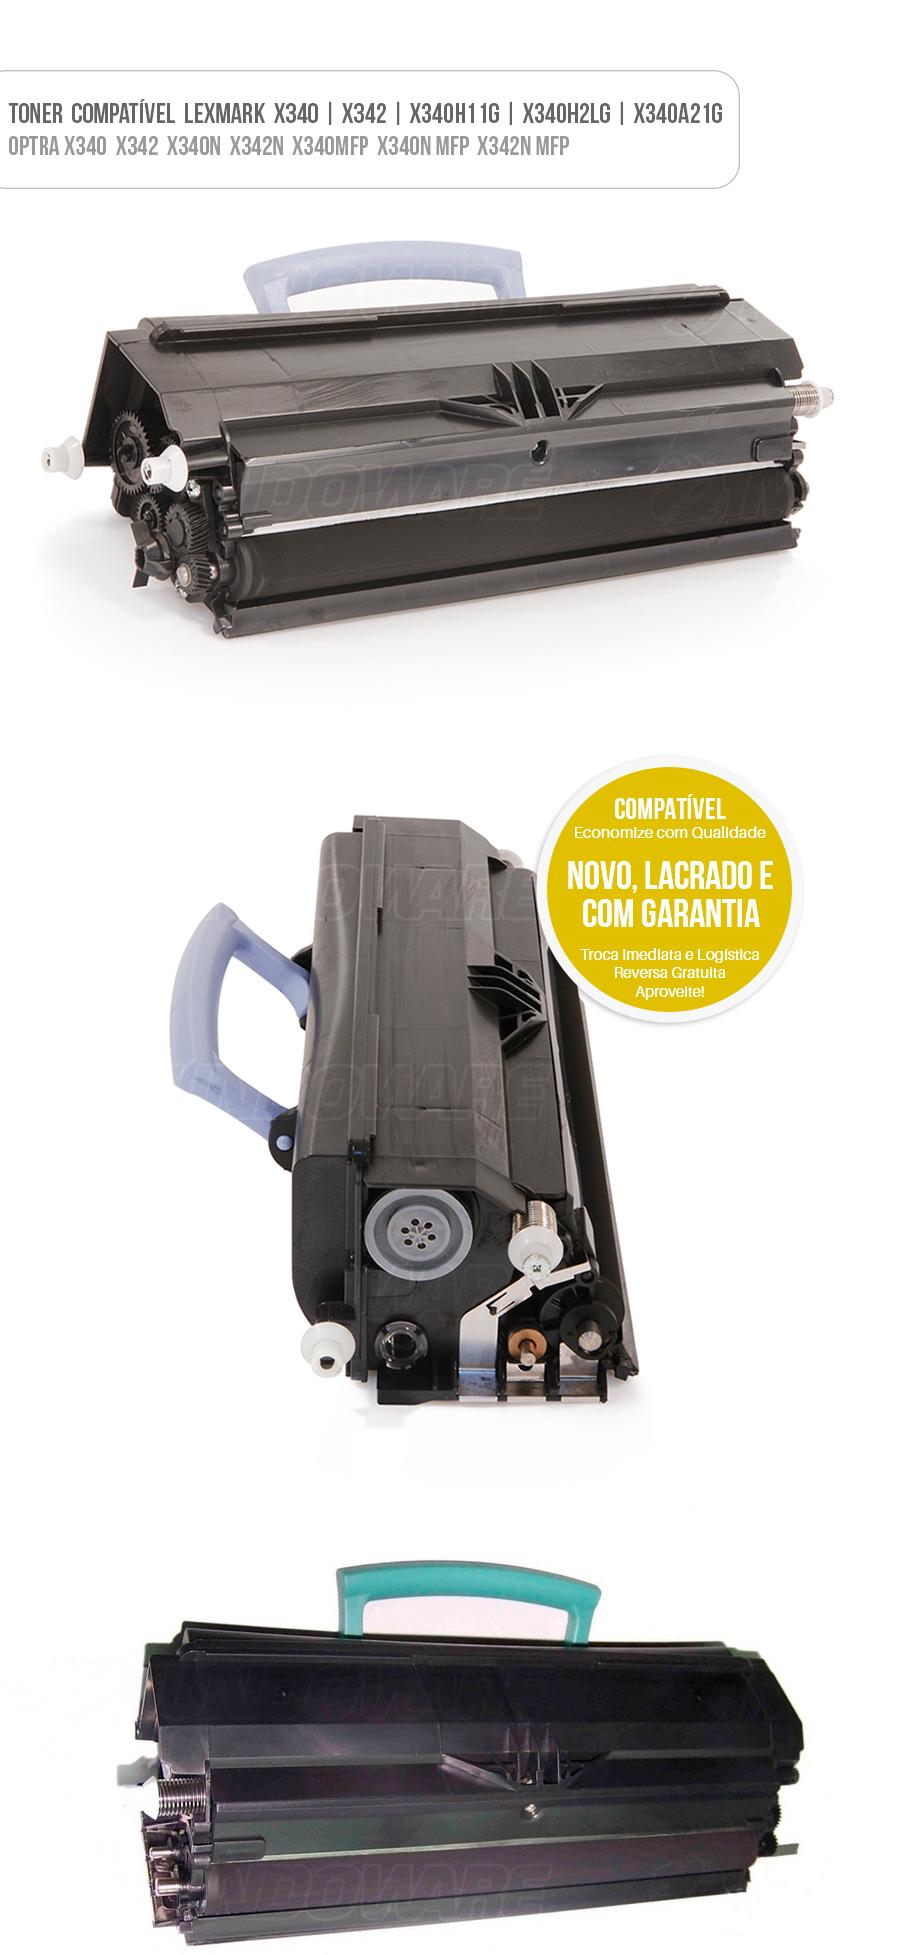 Tonner Compatível Lexmark X340 X342